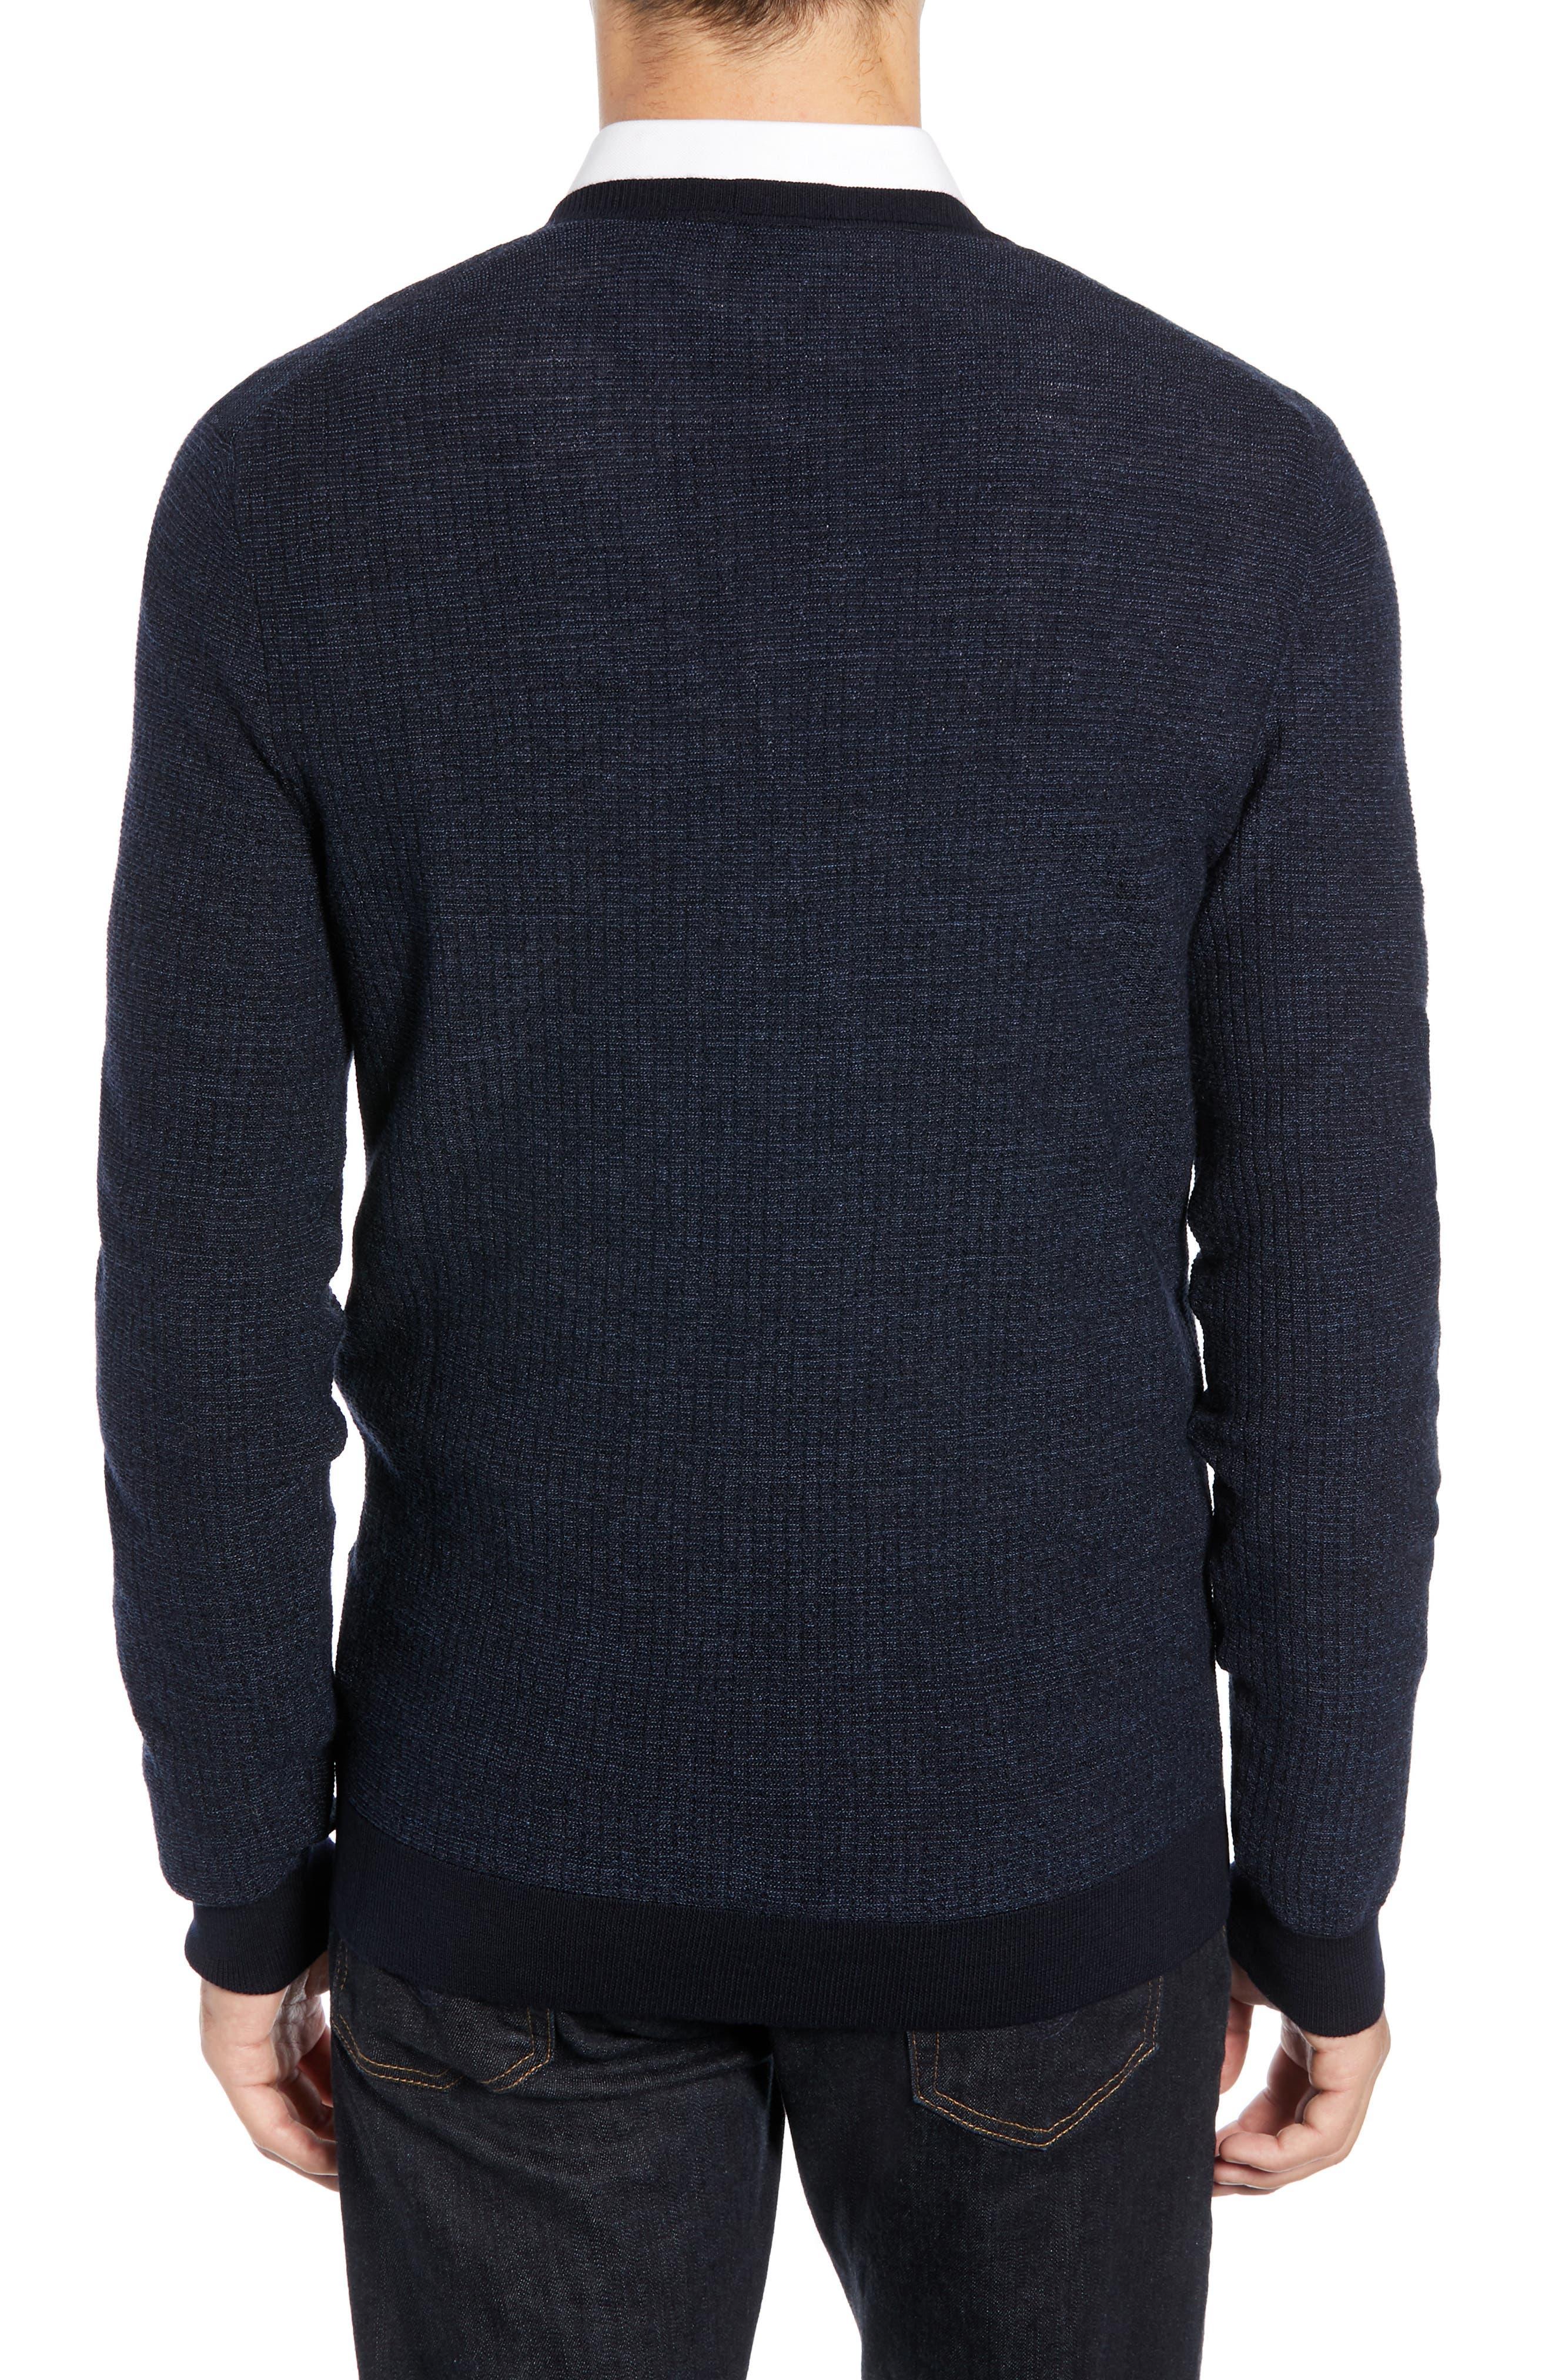 Emauro Mouline V-Neck Slim Fit Sweater,                             Alternate thumbnail 2, color,                             BLUE